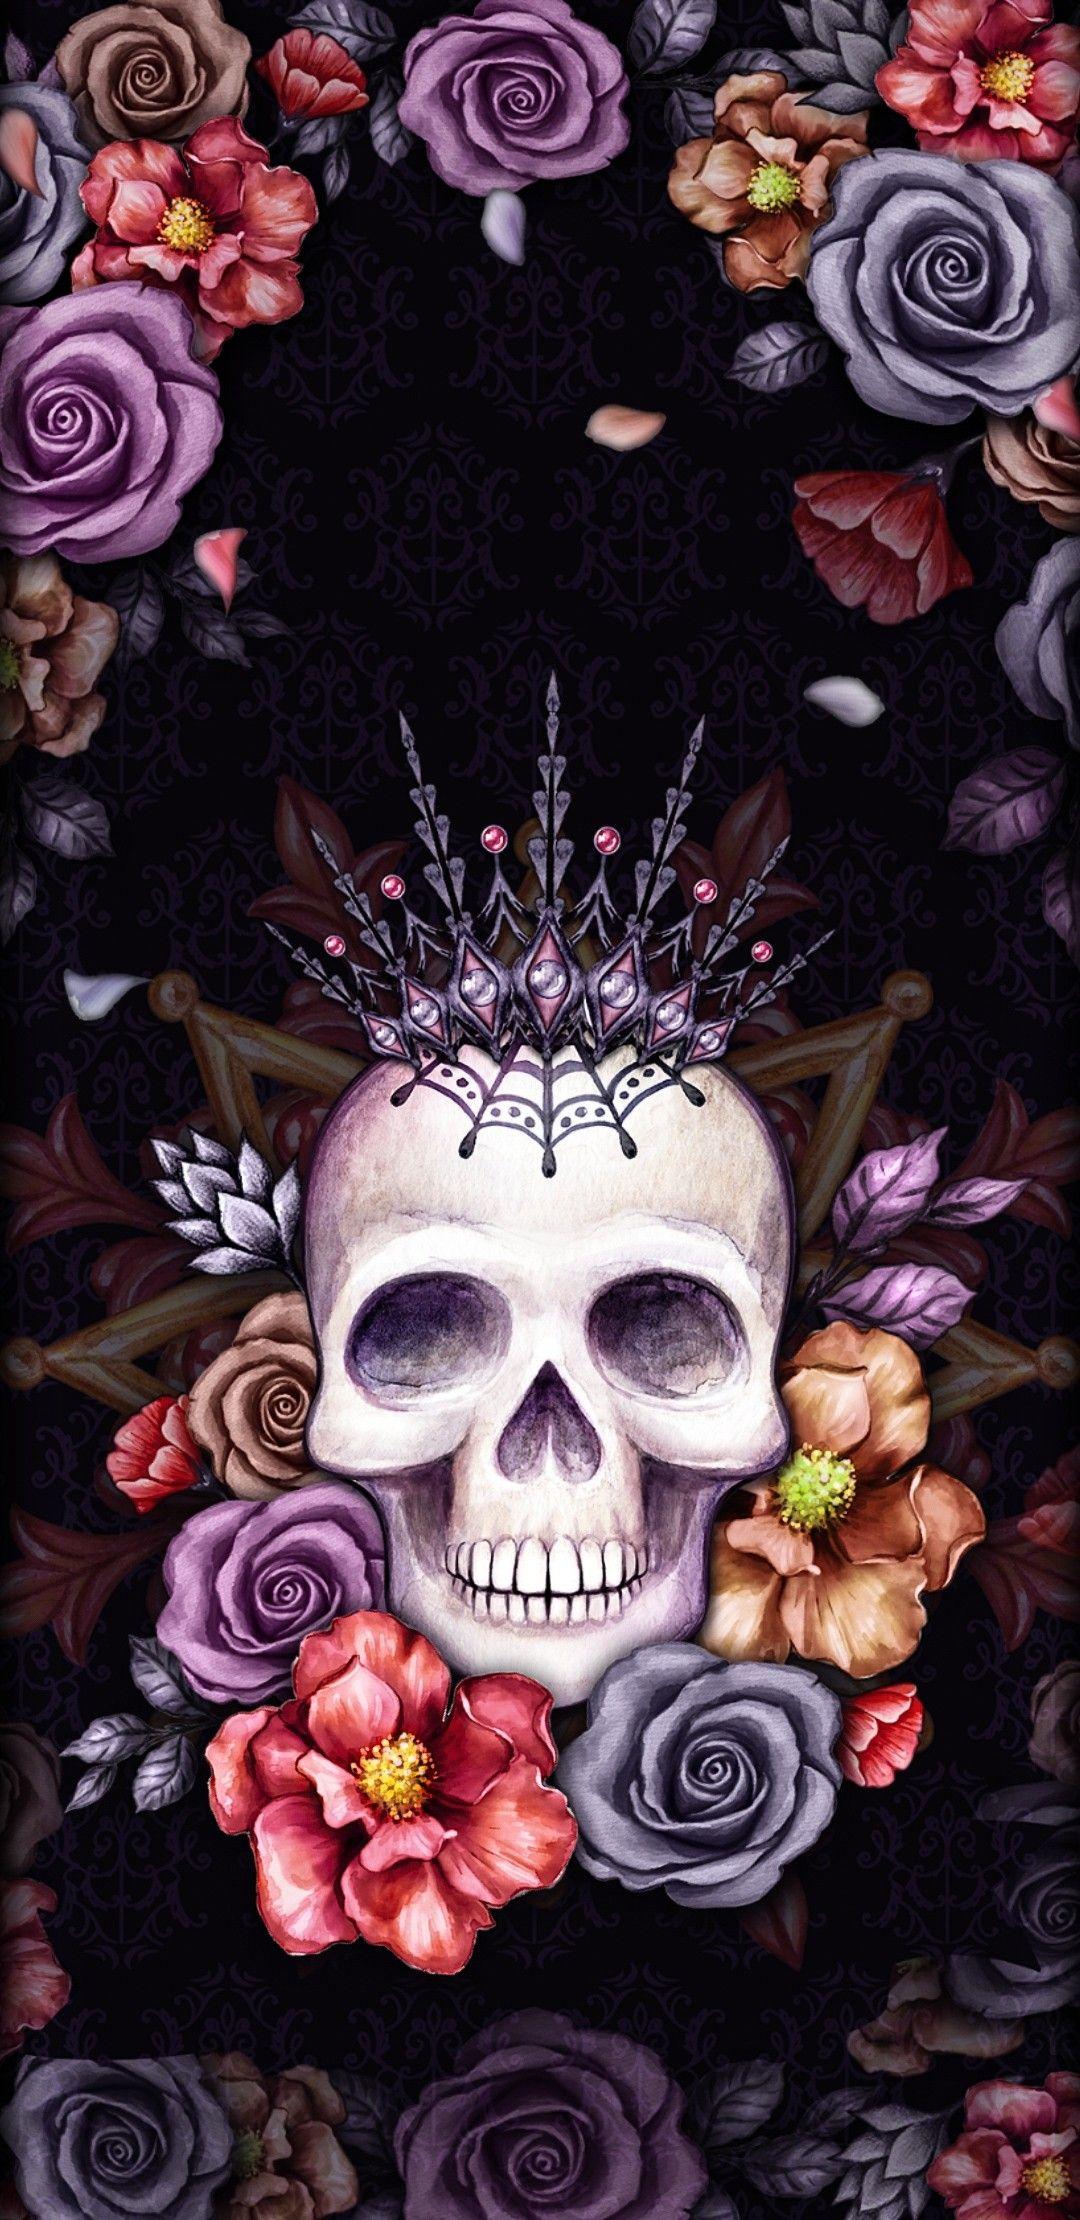 Wallpaper Lockscreen Iphone Android Sugar Skull Wallpaper Sugar Skull Artwork Skull Art